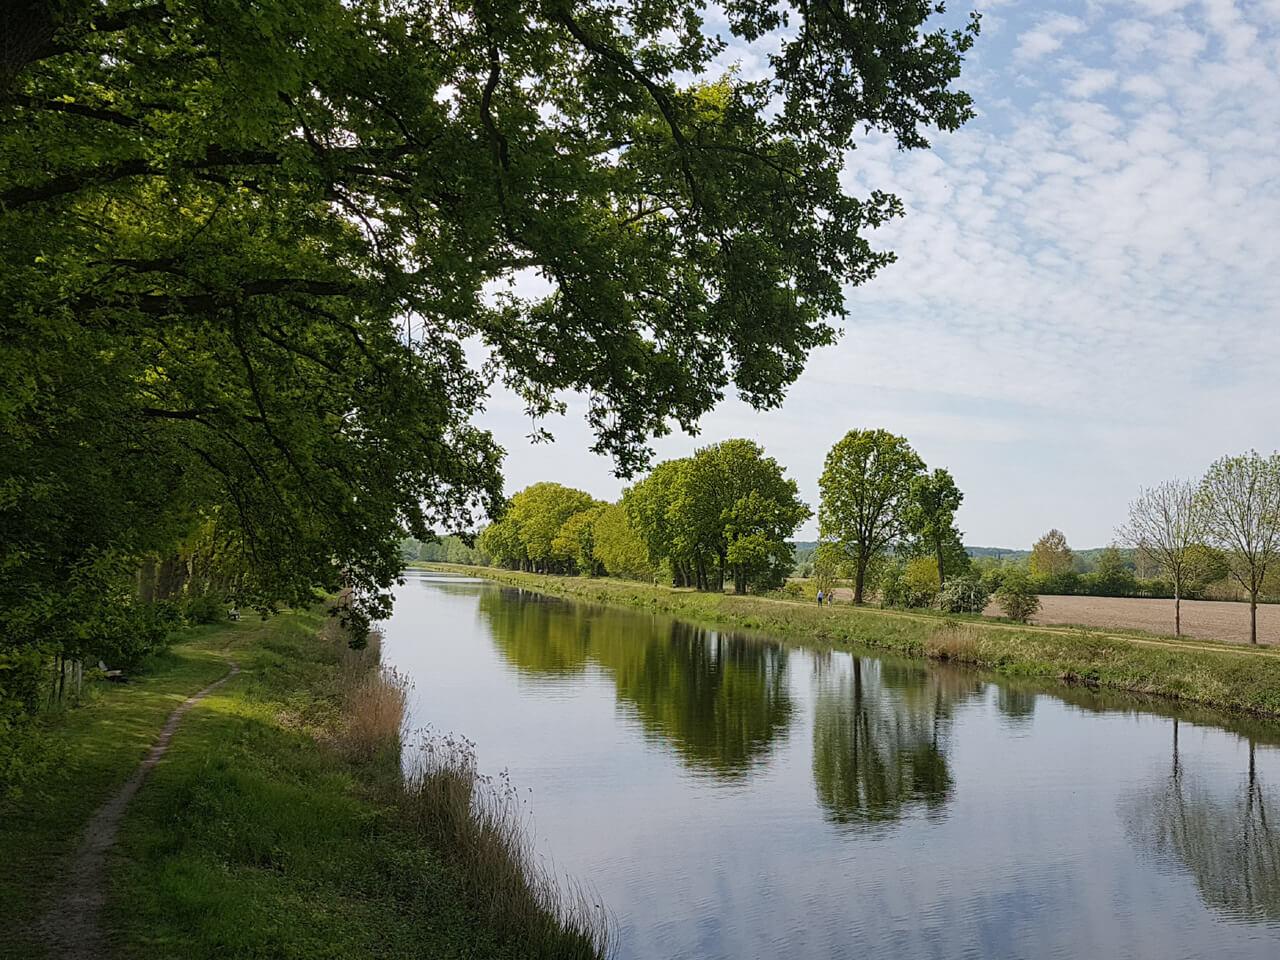 Spaziergang am Elbe-Lübeck-Kanal